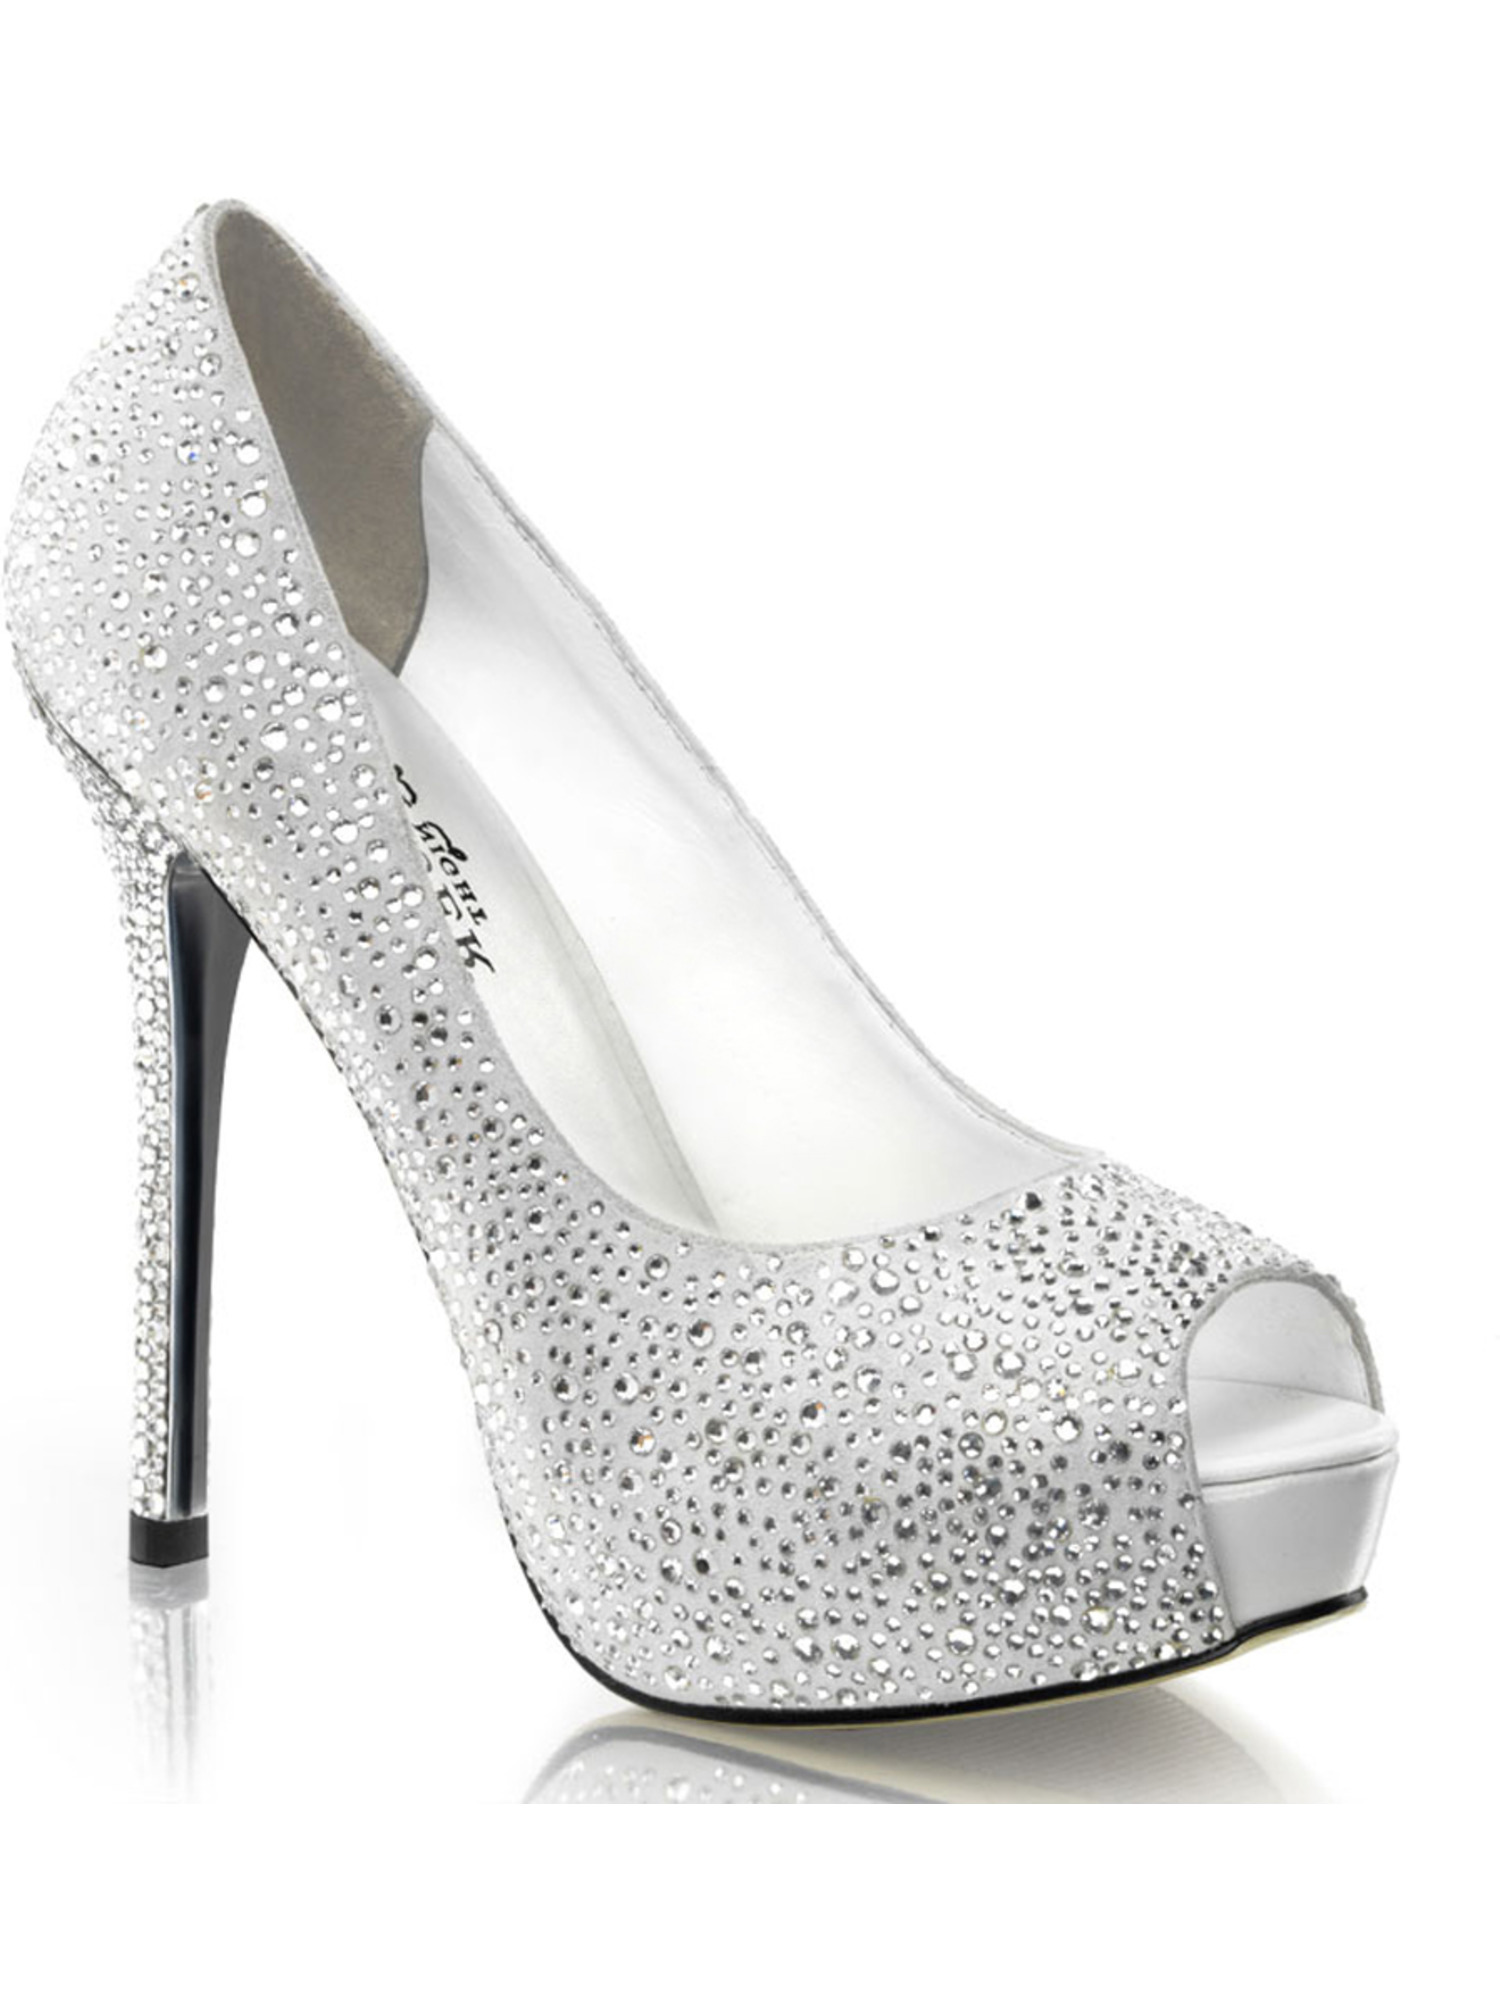 5 Inch Rhinestone Peep Toe Pumps Black Silver Women's Sexy High Heel Shoes